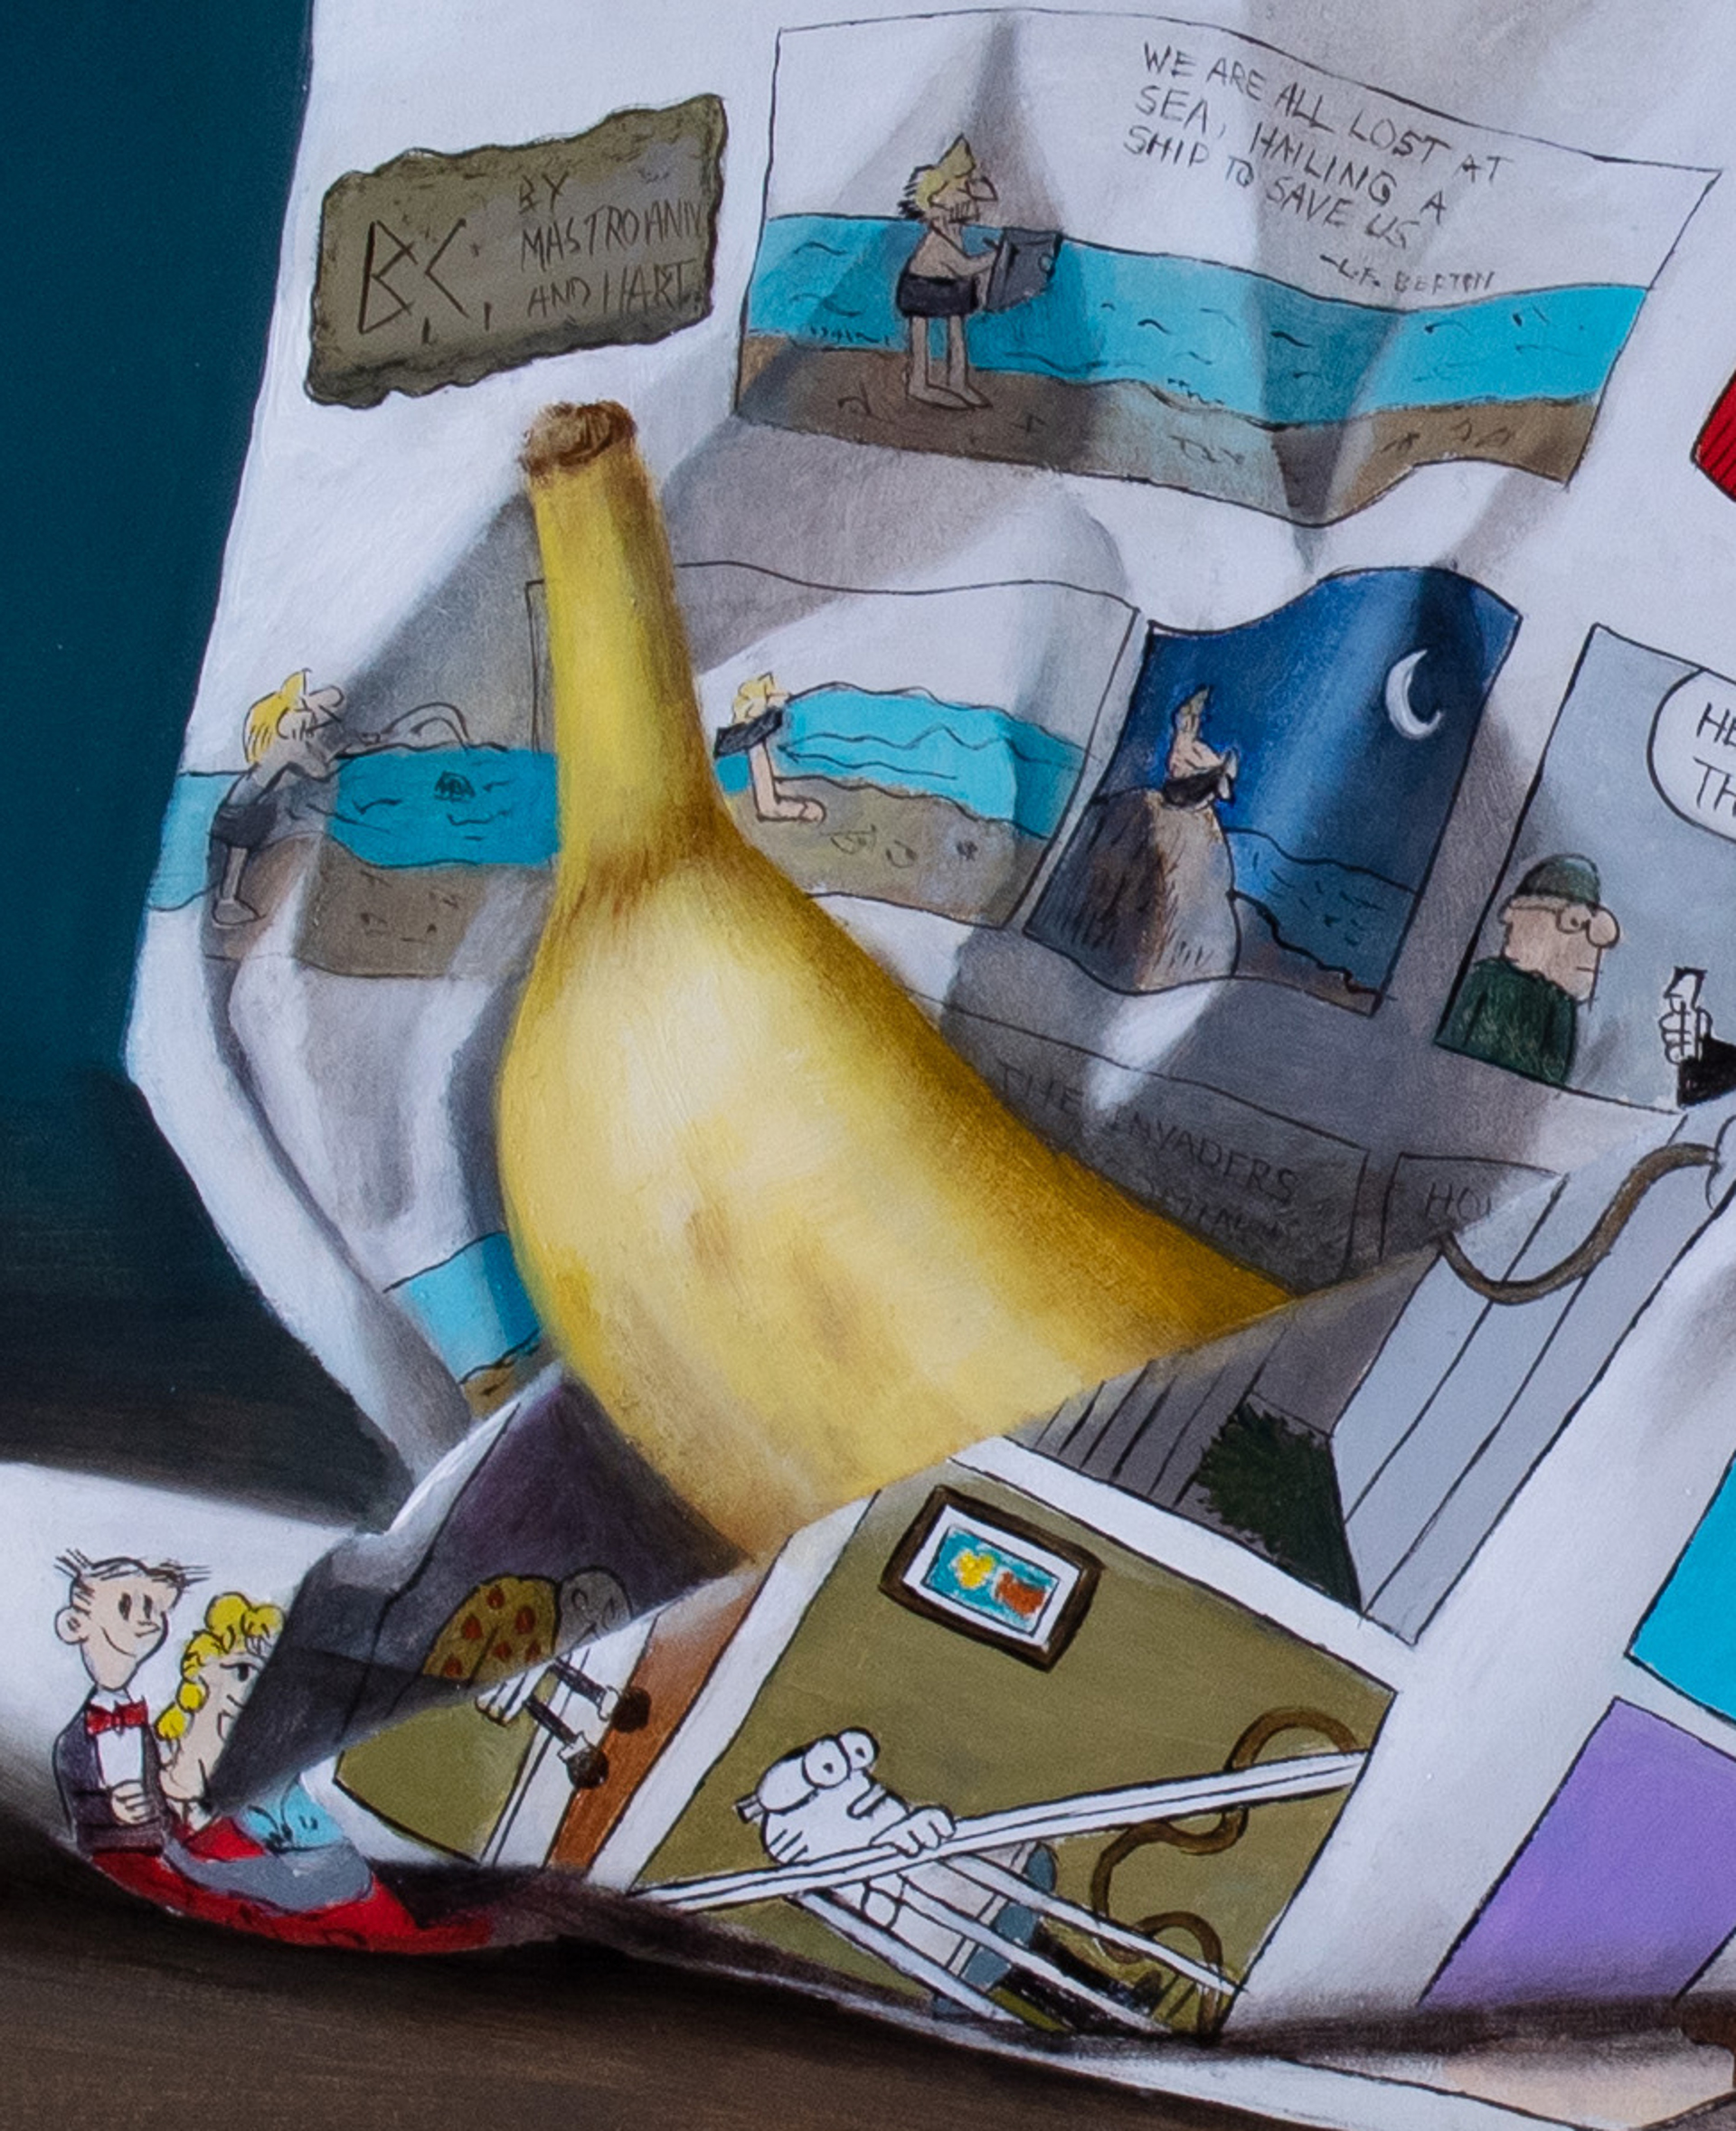 Burrowed Banana by Kelly Birkenruth